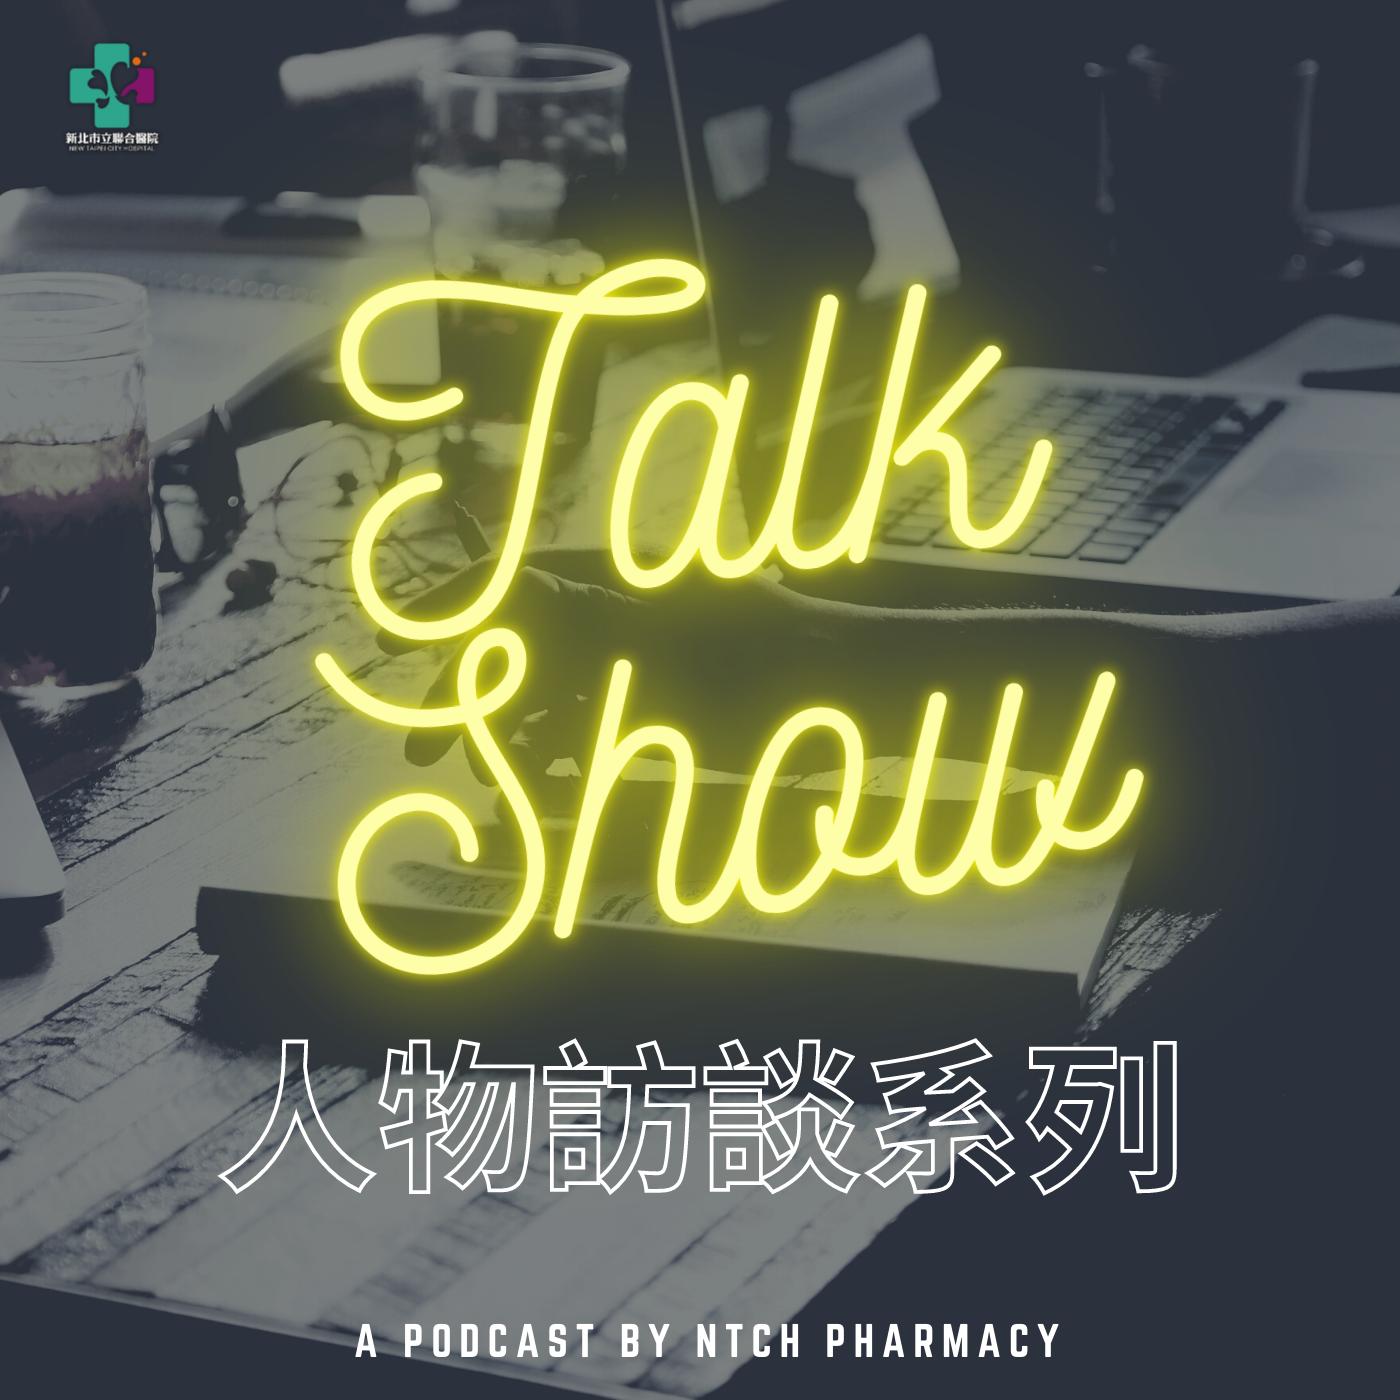 【 Talk Show 】EP.1 馬來西亞VS臺灣 藥界與醫療生態差異分享(上集)  feat.馬來西亞僑生小梁